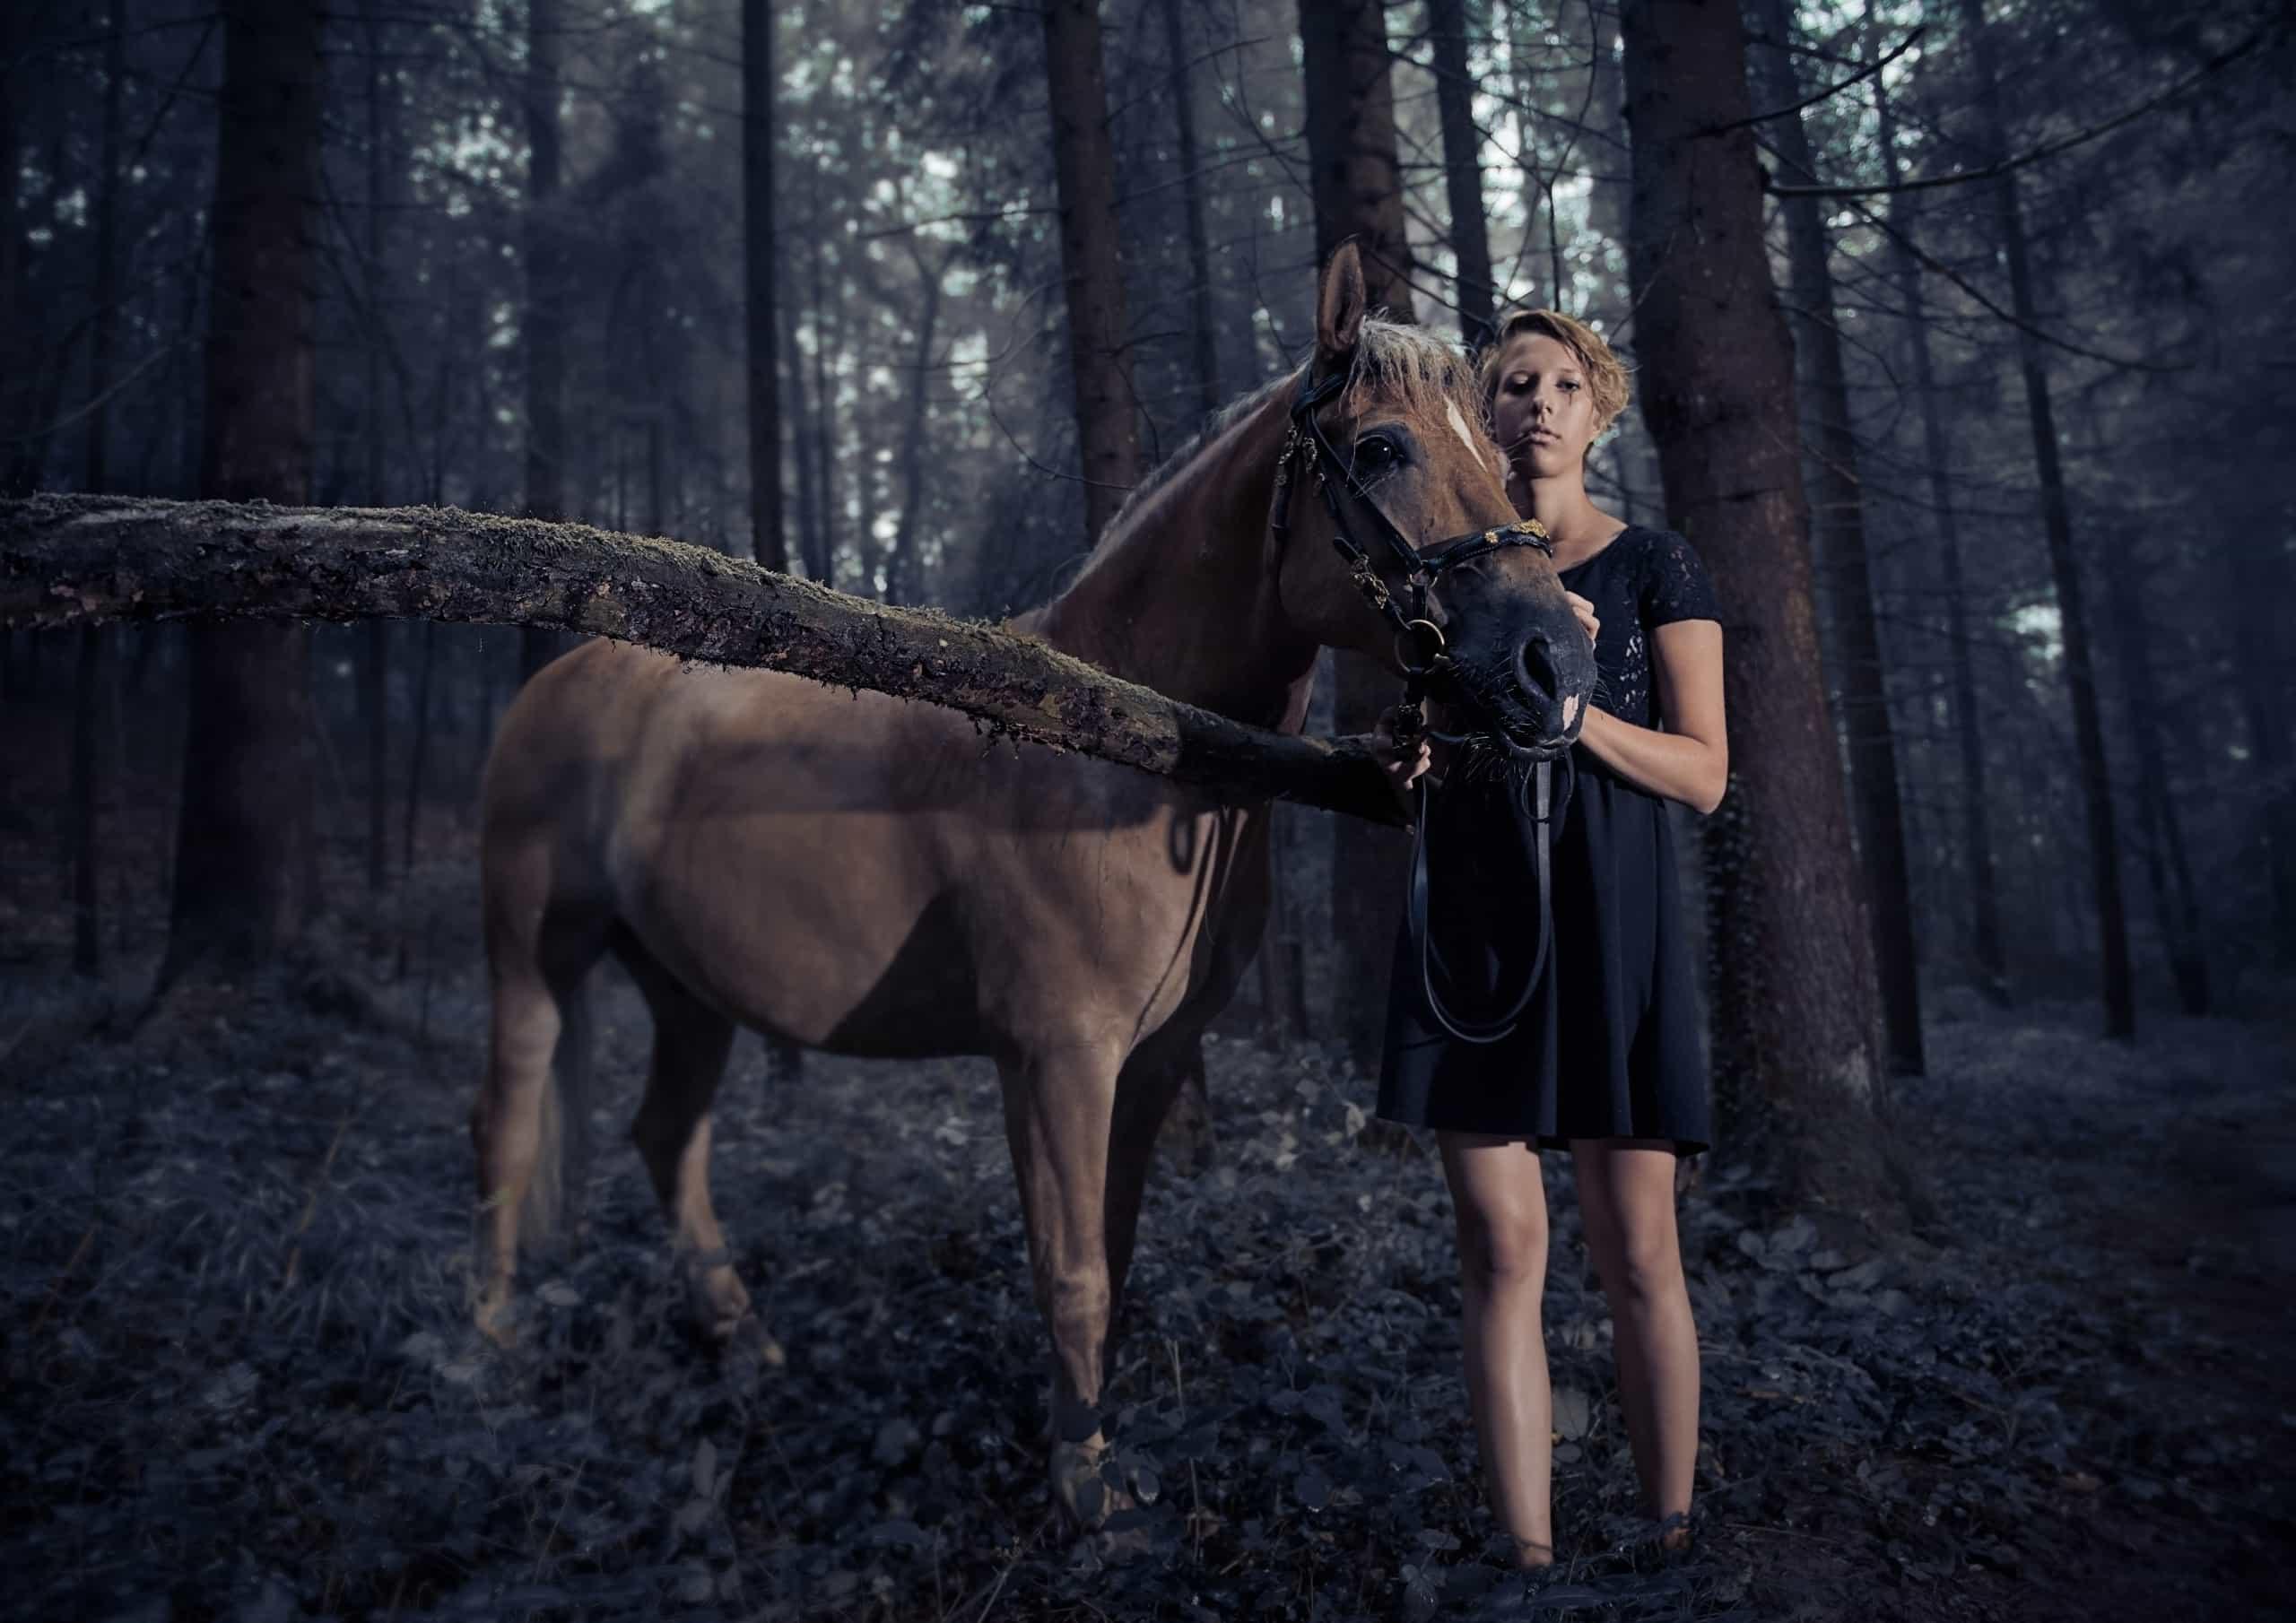 Melisa mit Pferd-_SAJ0764